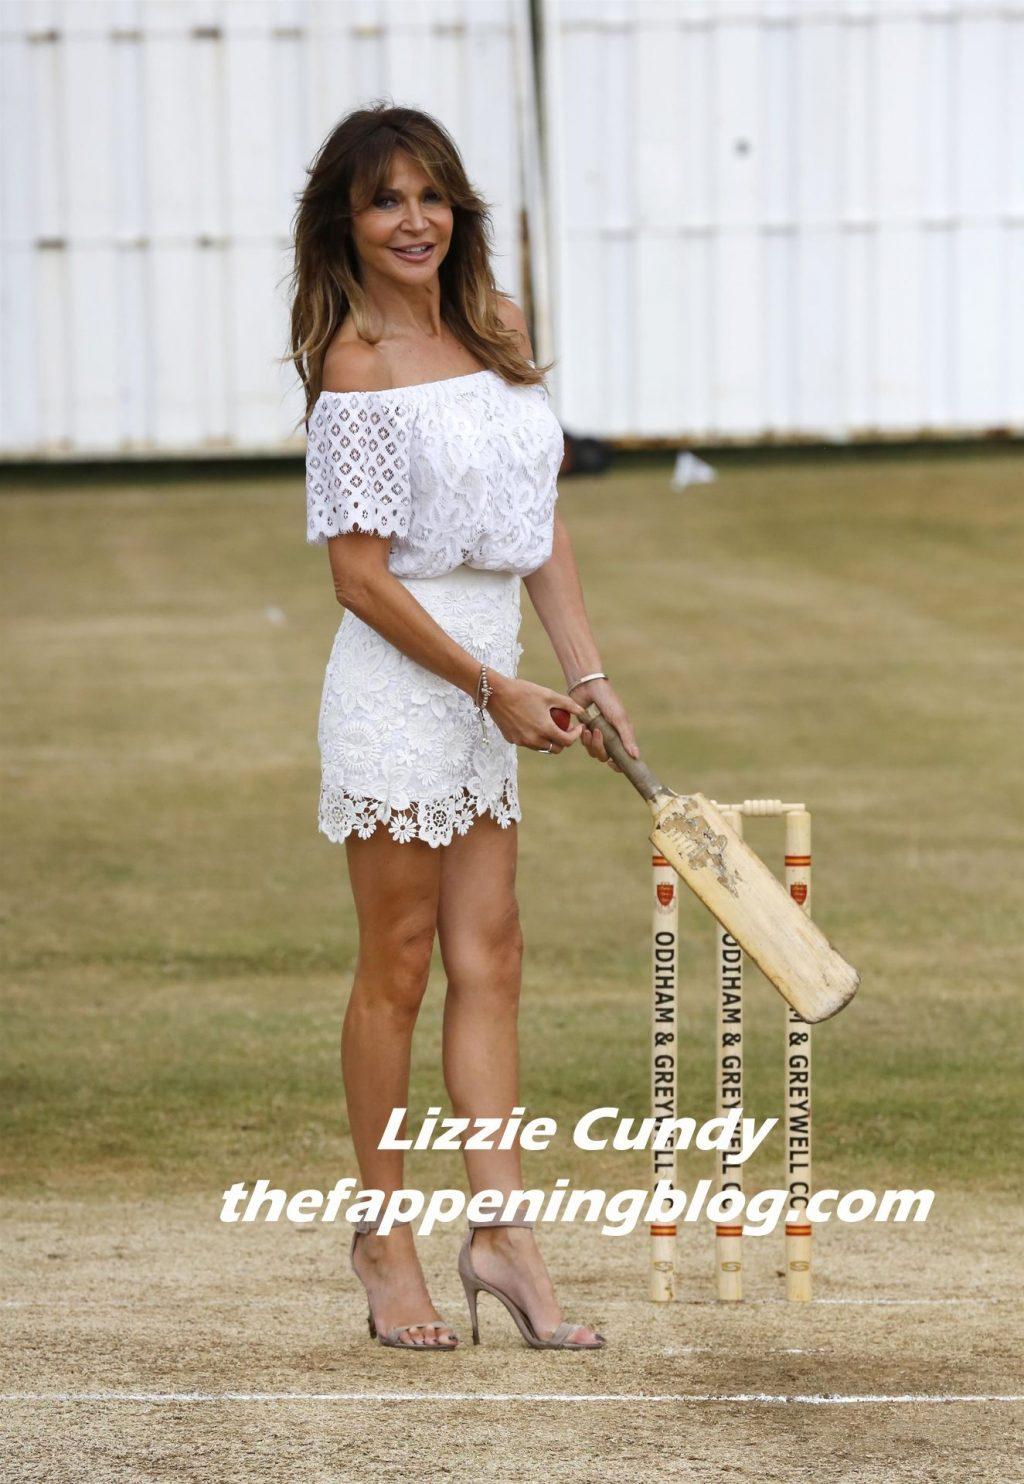 lizzie-cundy